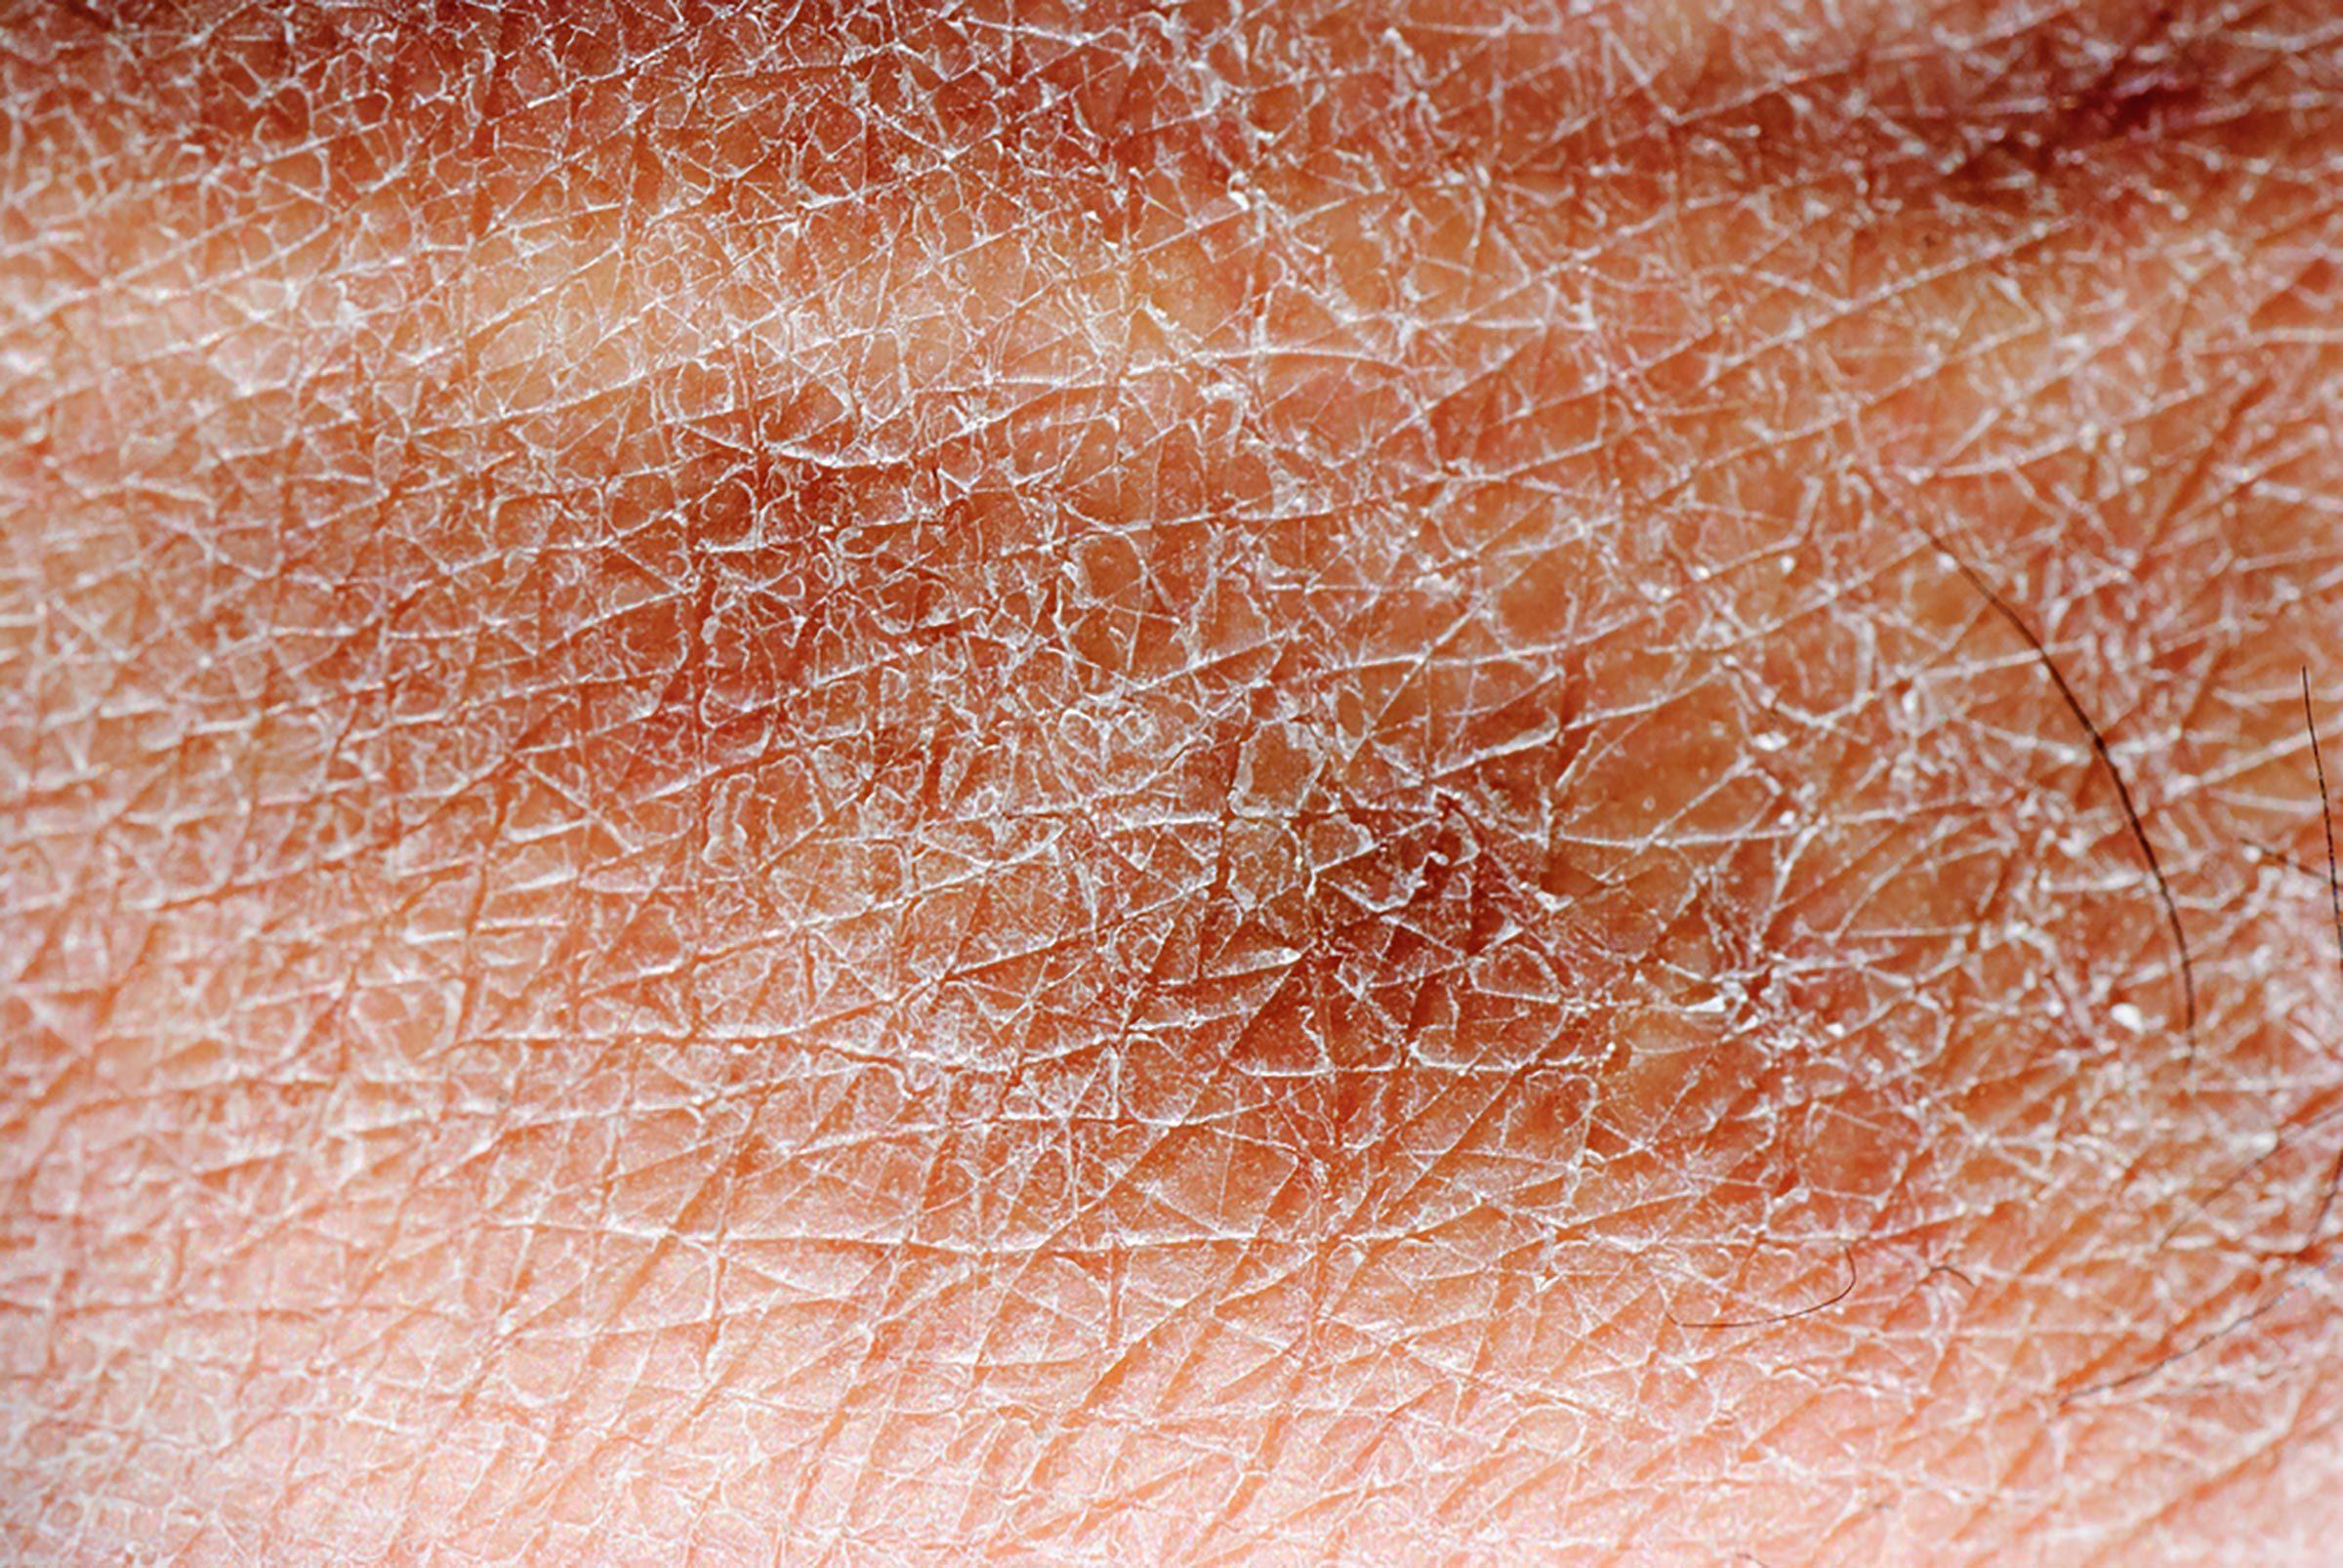 Dry skin